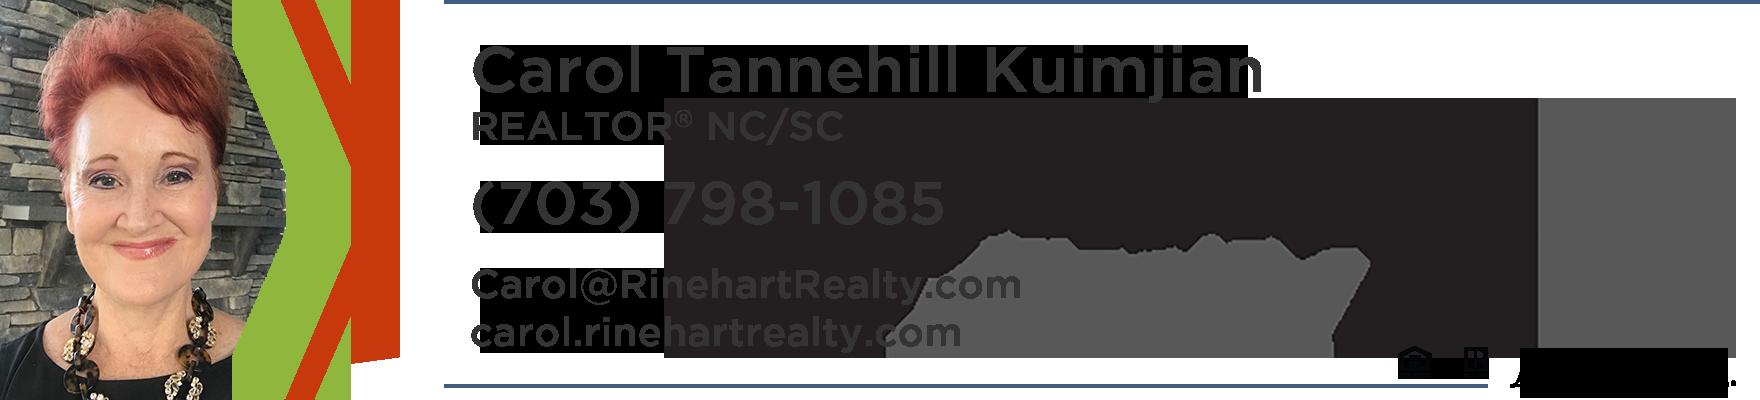 Carol Tannehill Kuimjian